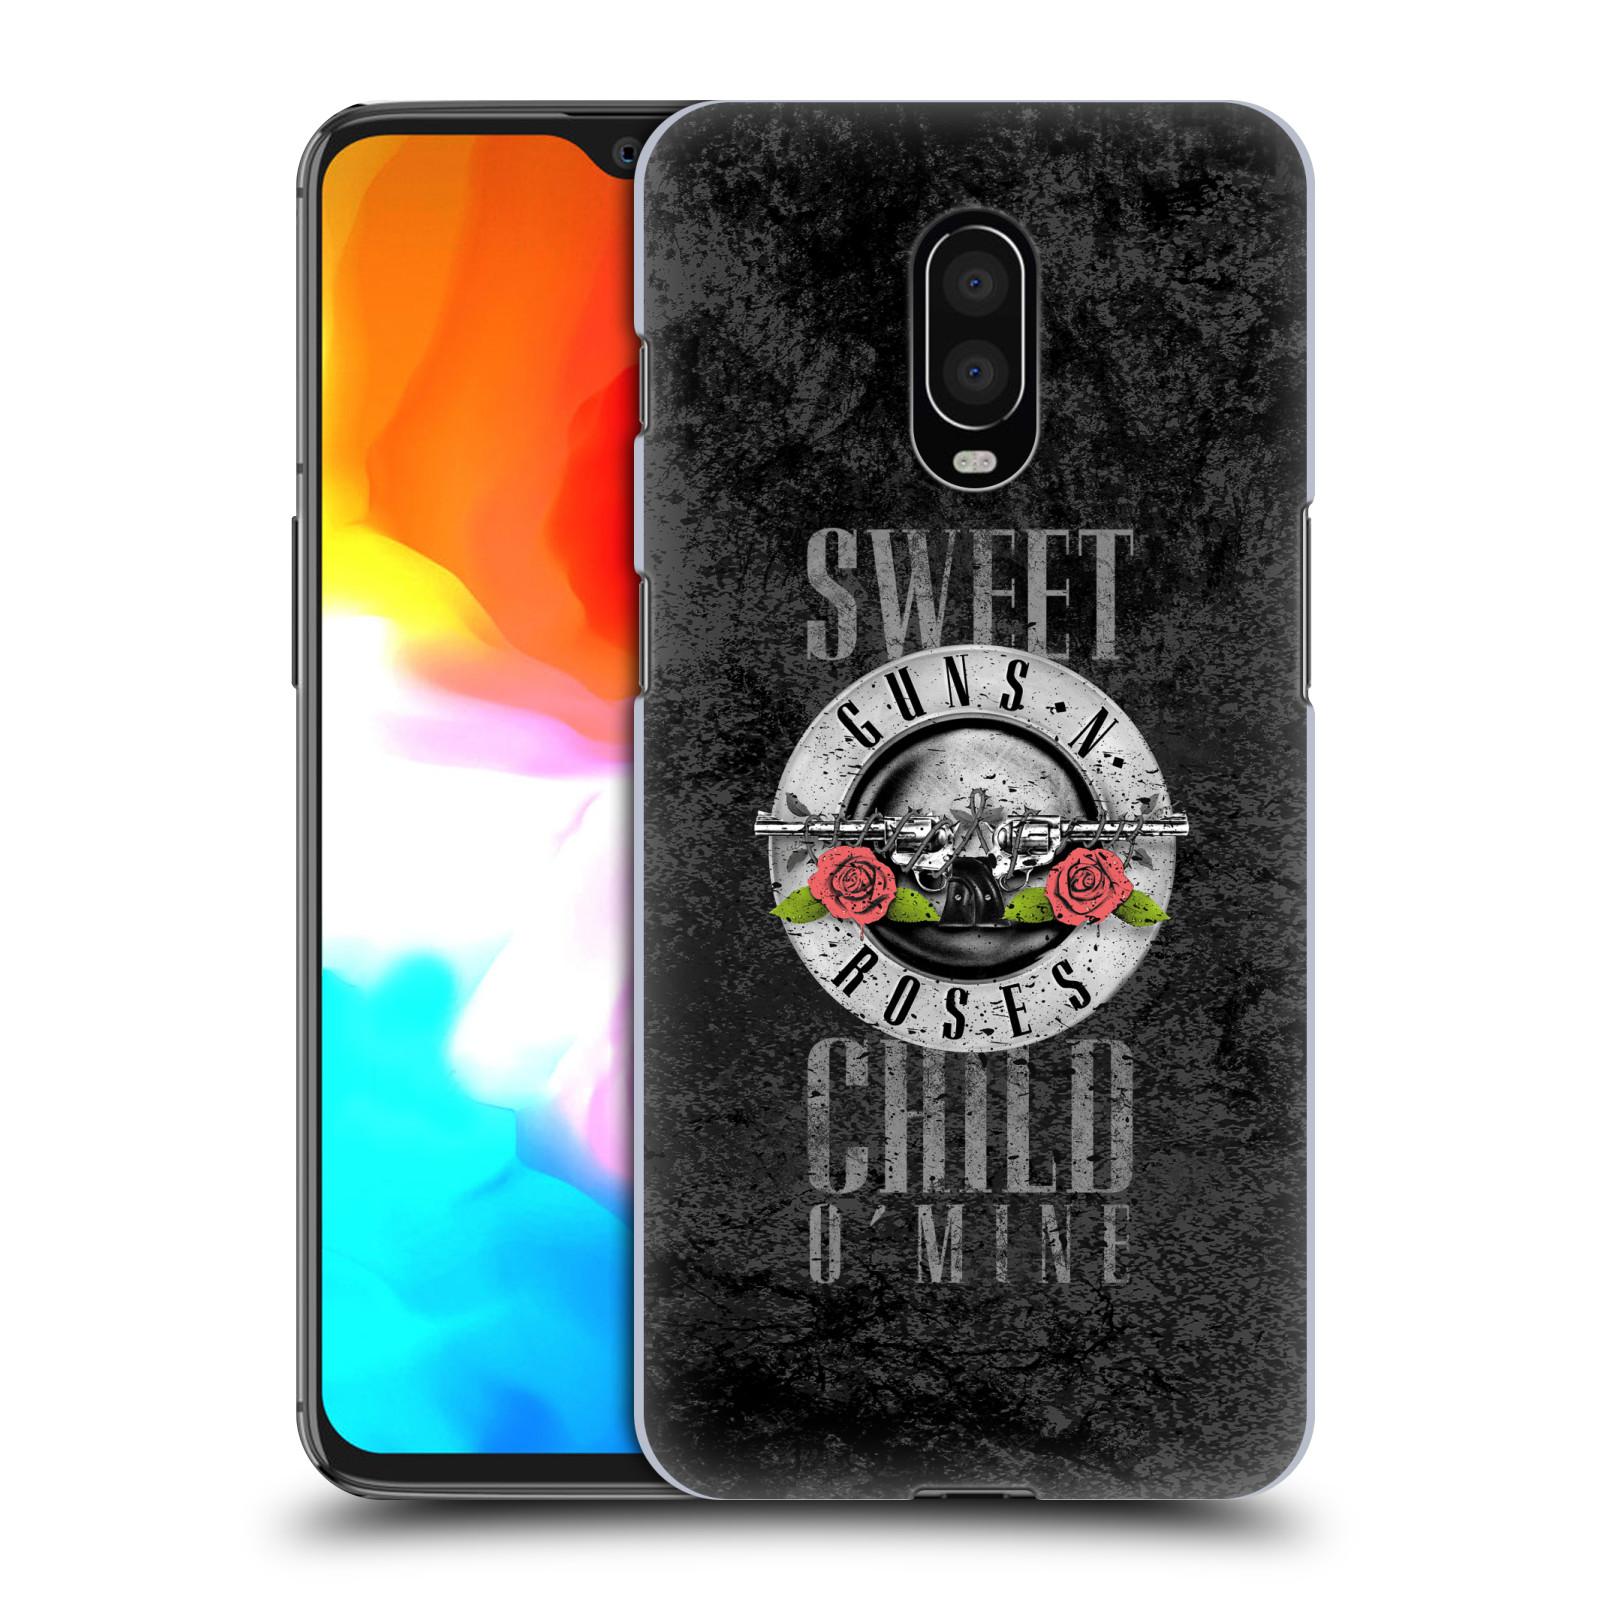 Plastové pouzdro na mobil OnePlus 6T - Head Case - Guns N' Roses - Sweet Child